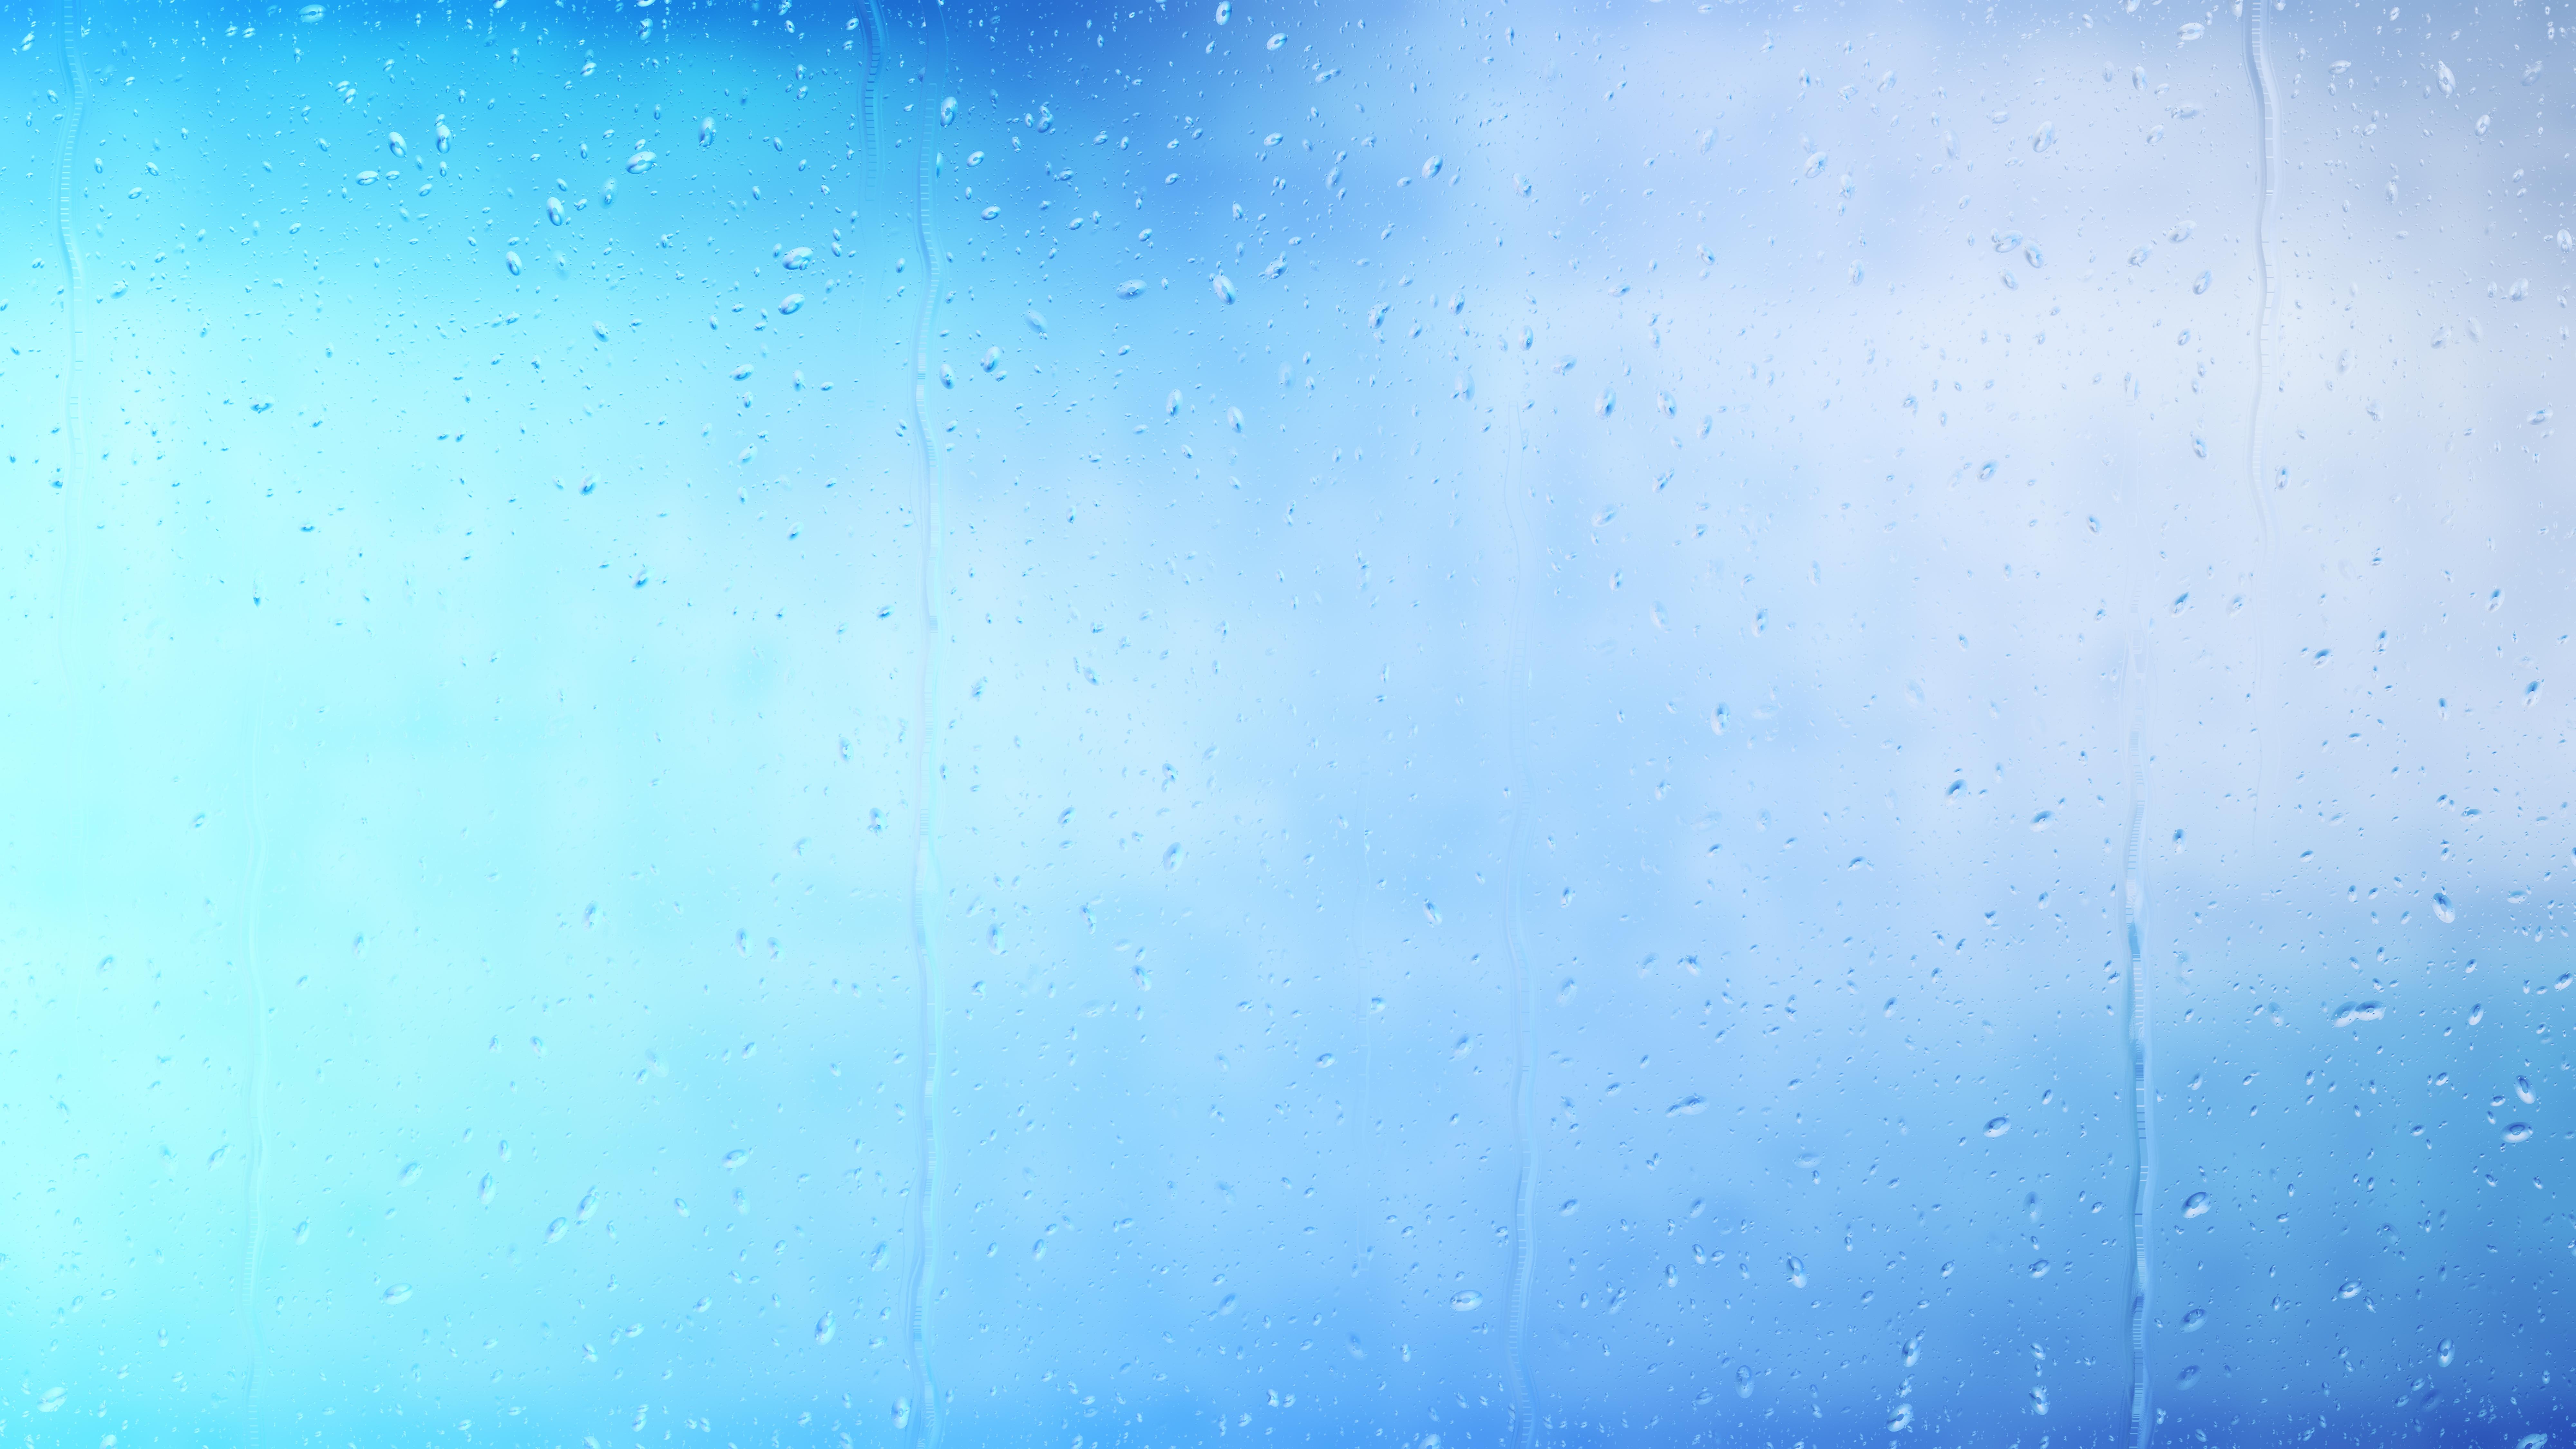 Download 75 Background Blue Water HD Paling Keren